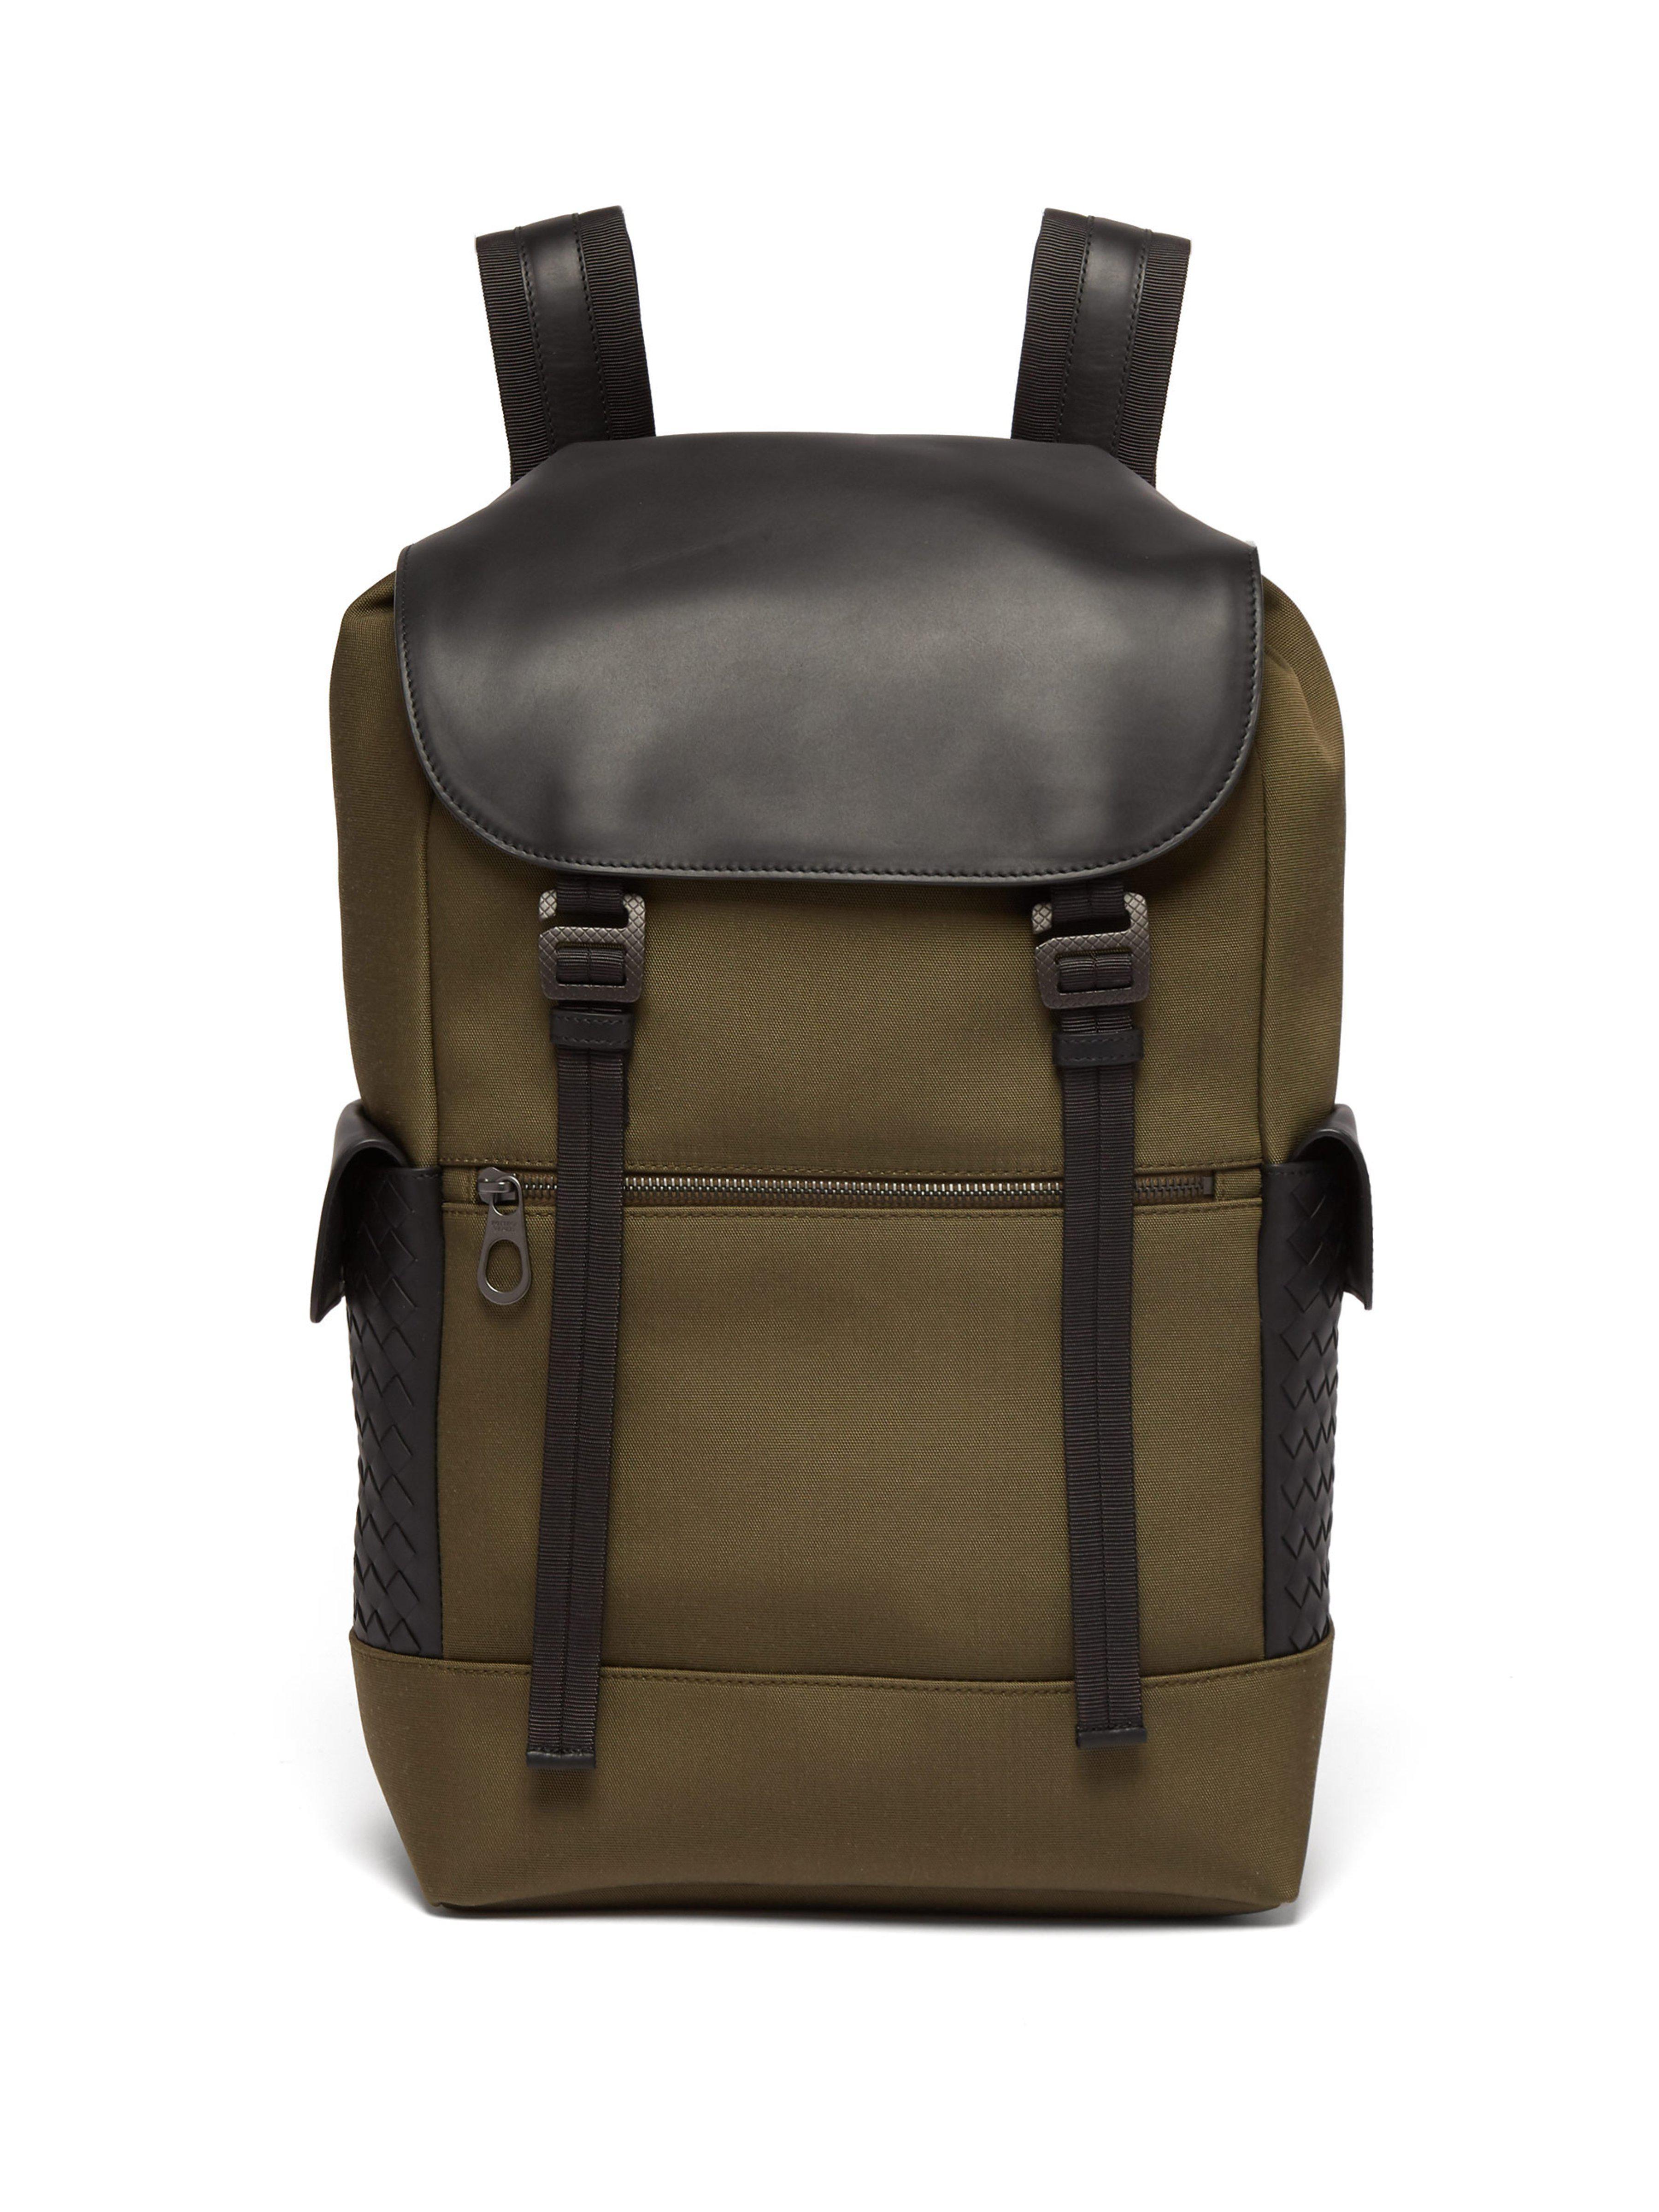 2fc223fbcaf6 Bottega Veneta Sassolungo Canvas And Leather Backpack for Men - Lyst